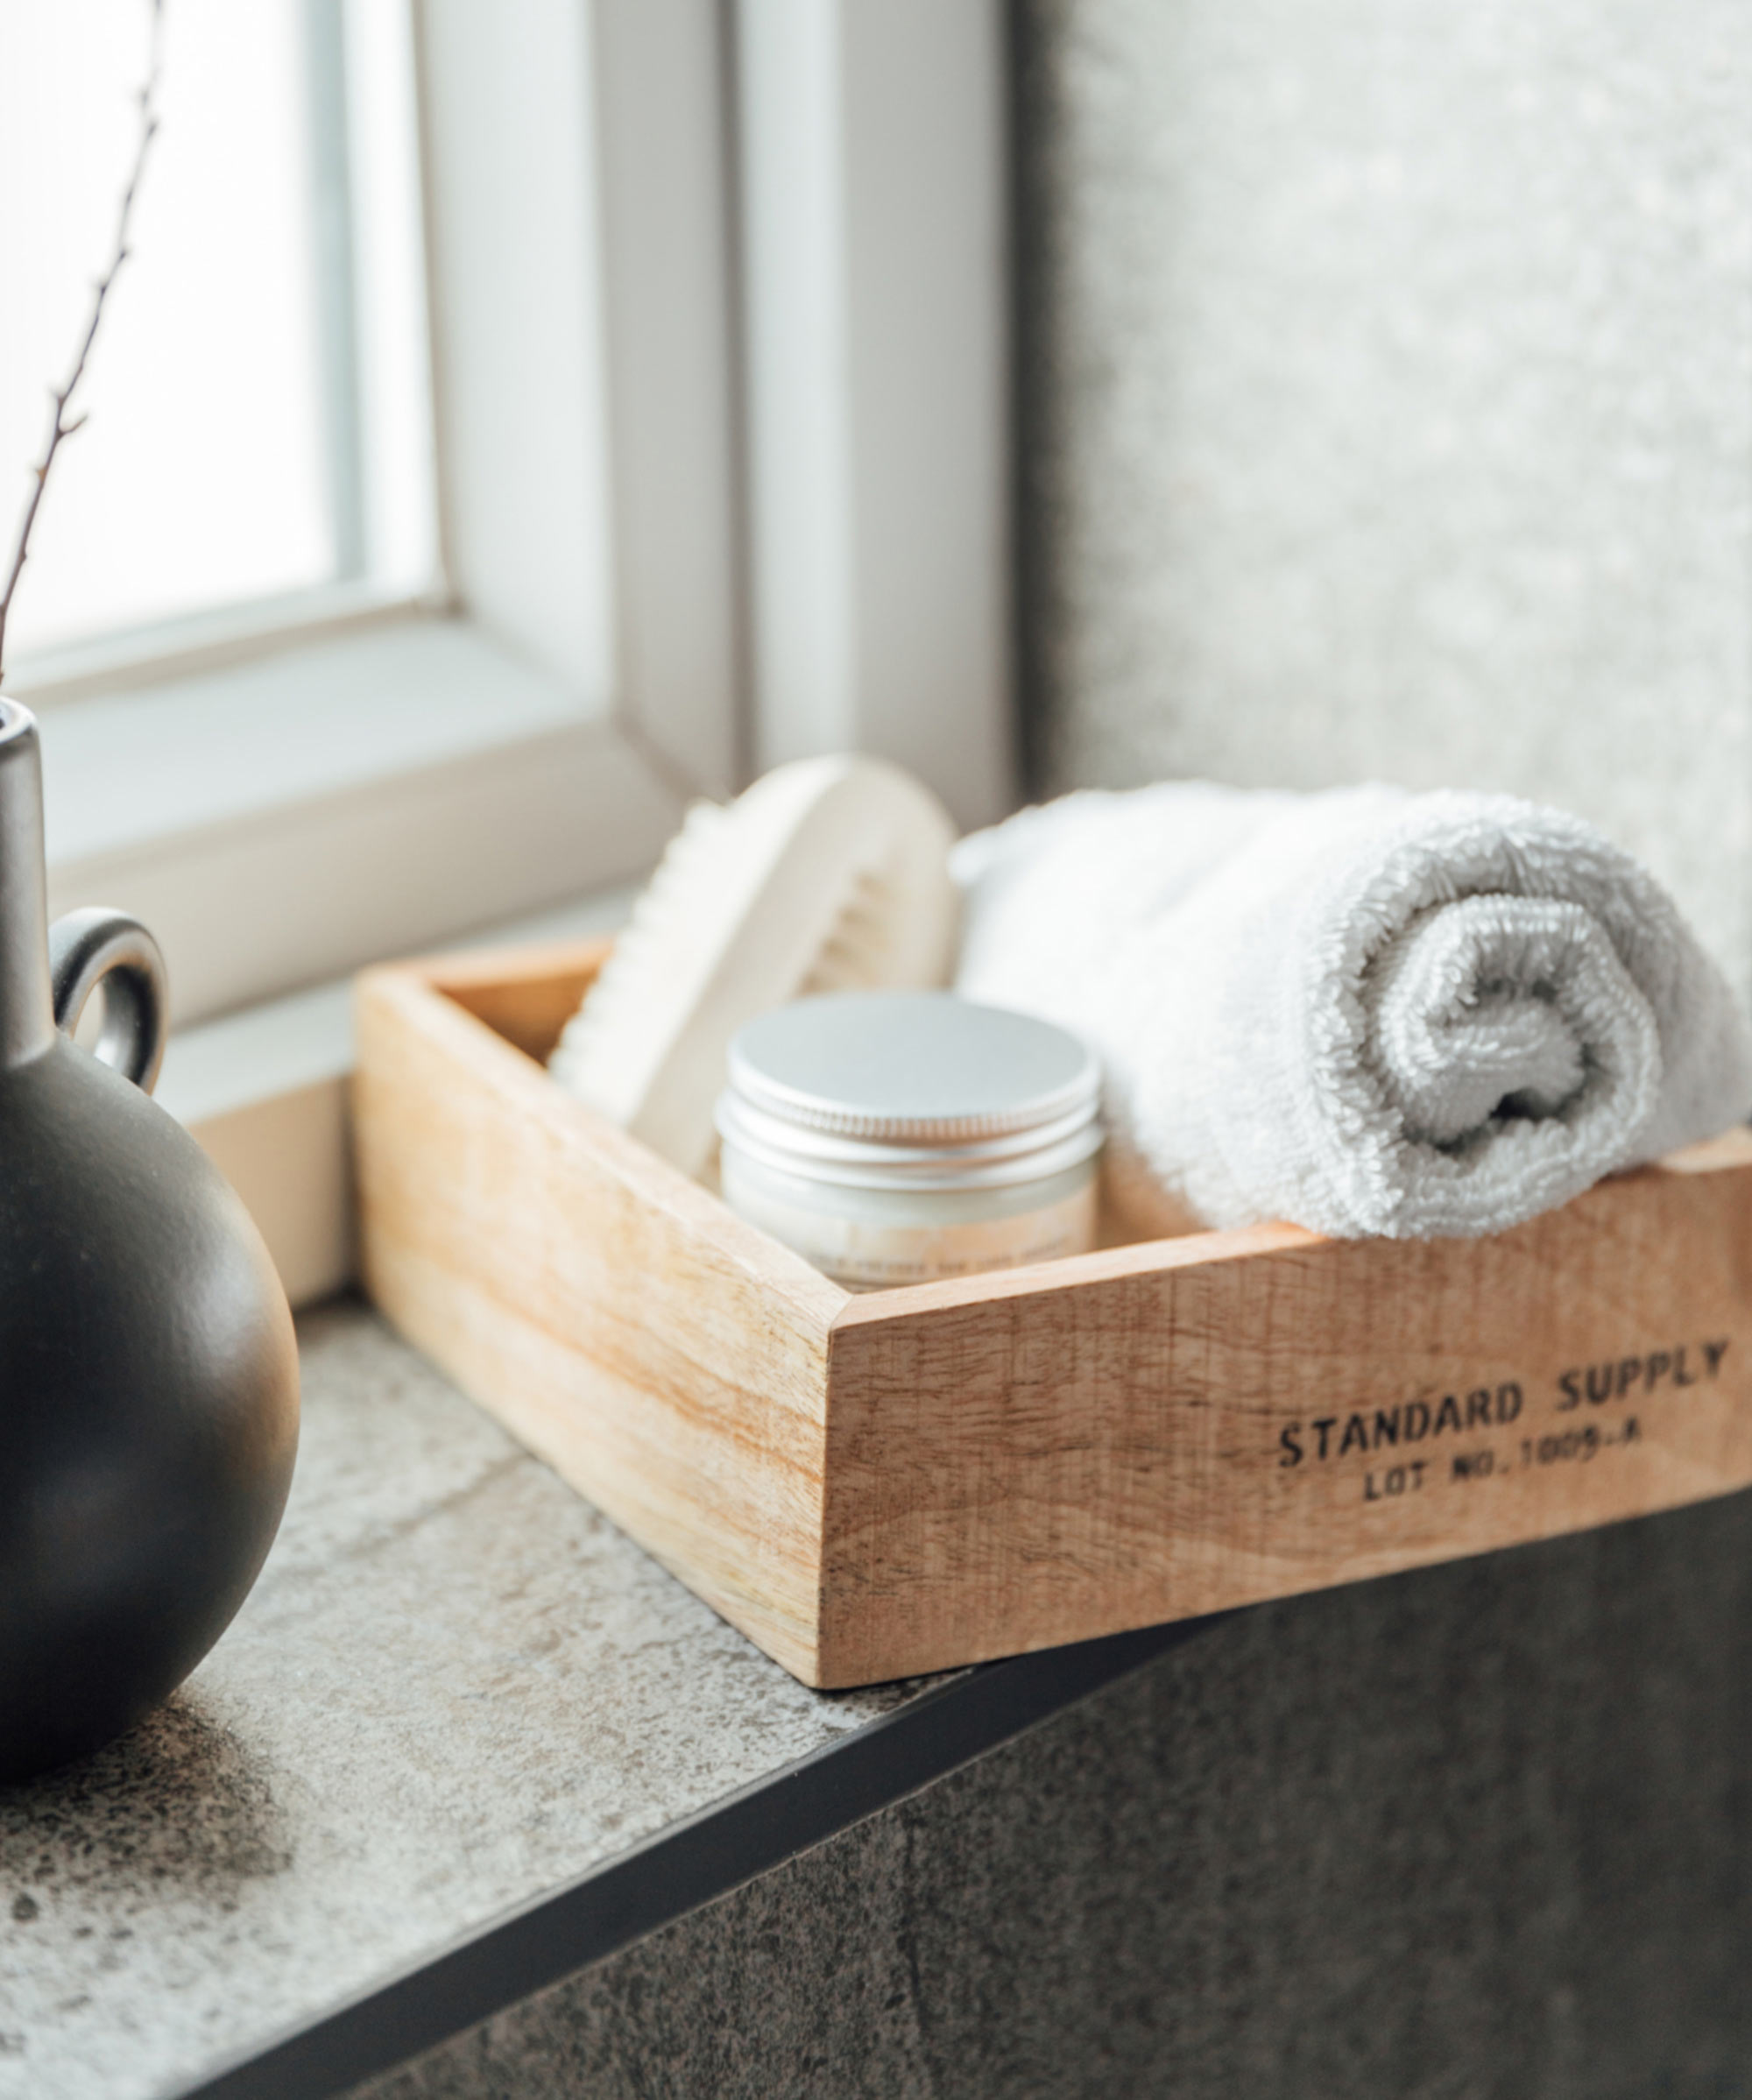 13 wooden-storage-tray-dark-tiled-bathroom-.jpg